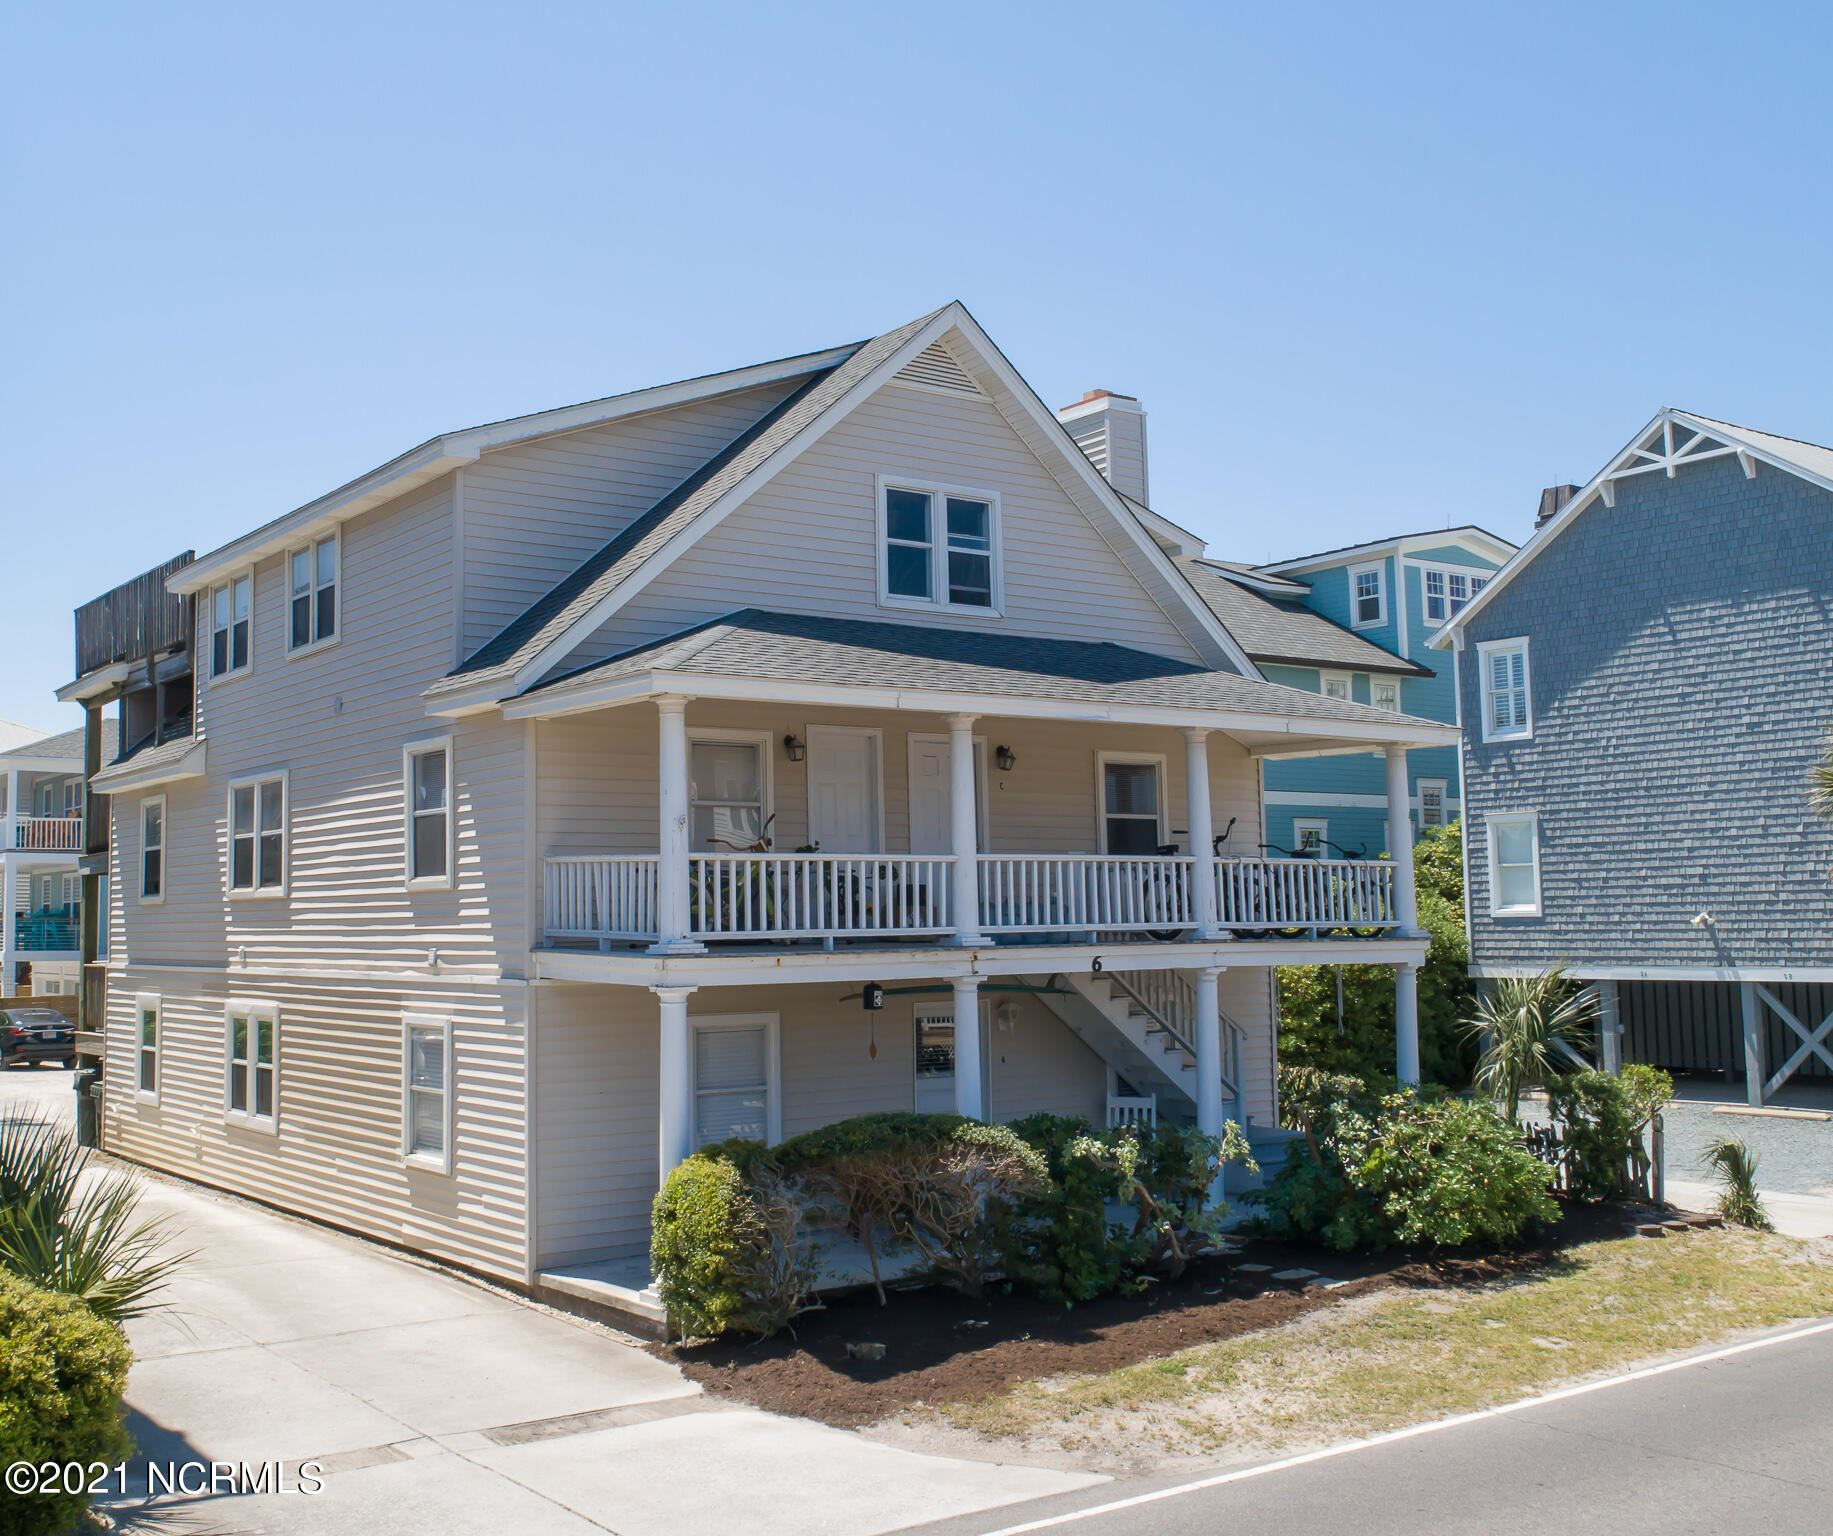 Photo of 6 Sunset Avenue, Wrightsville Beach, NC 28480 (MLS # 100268816)